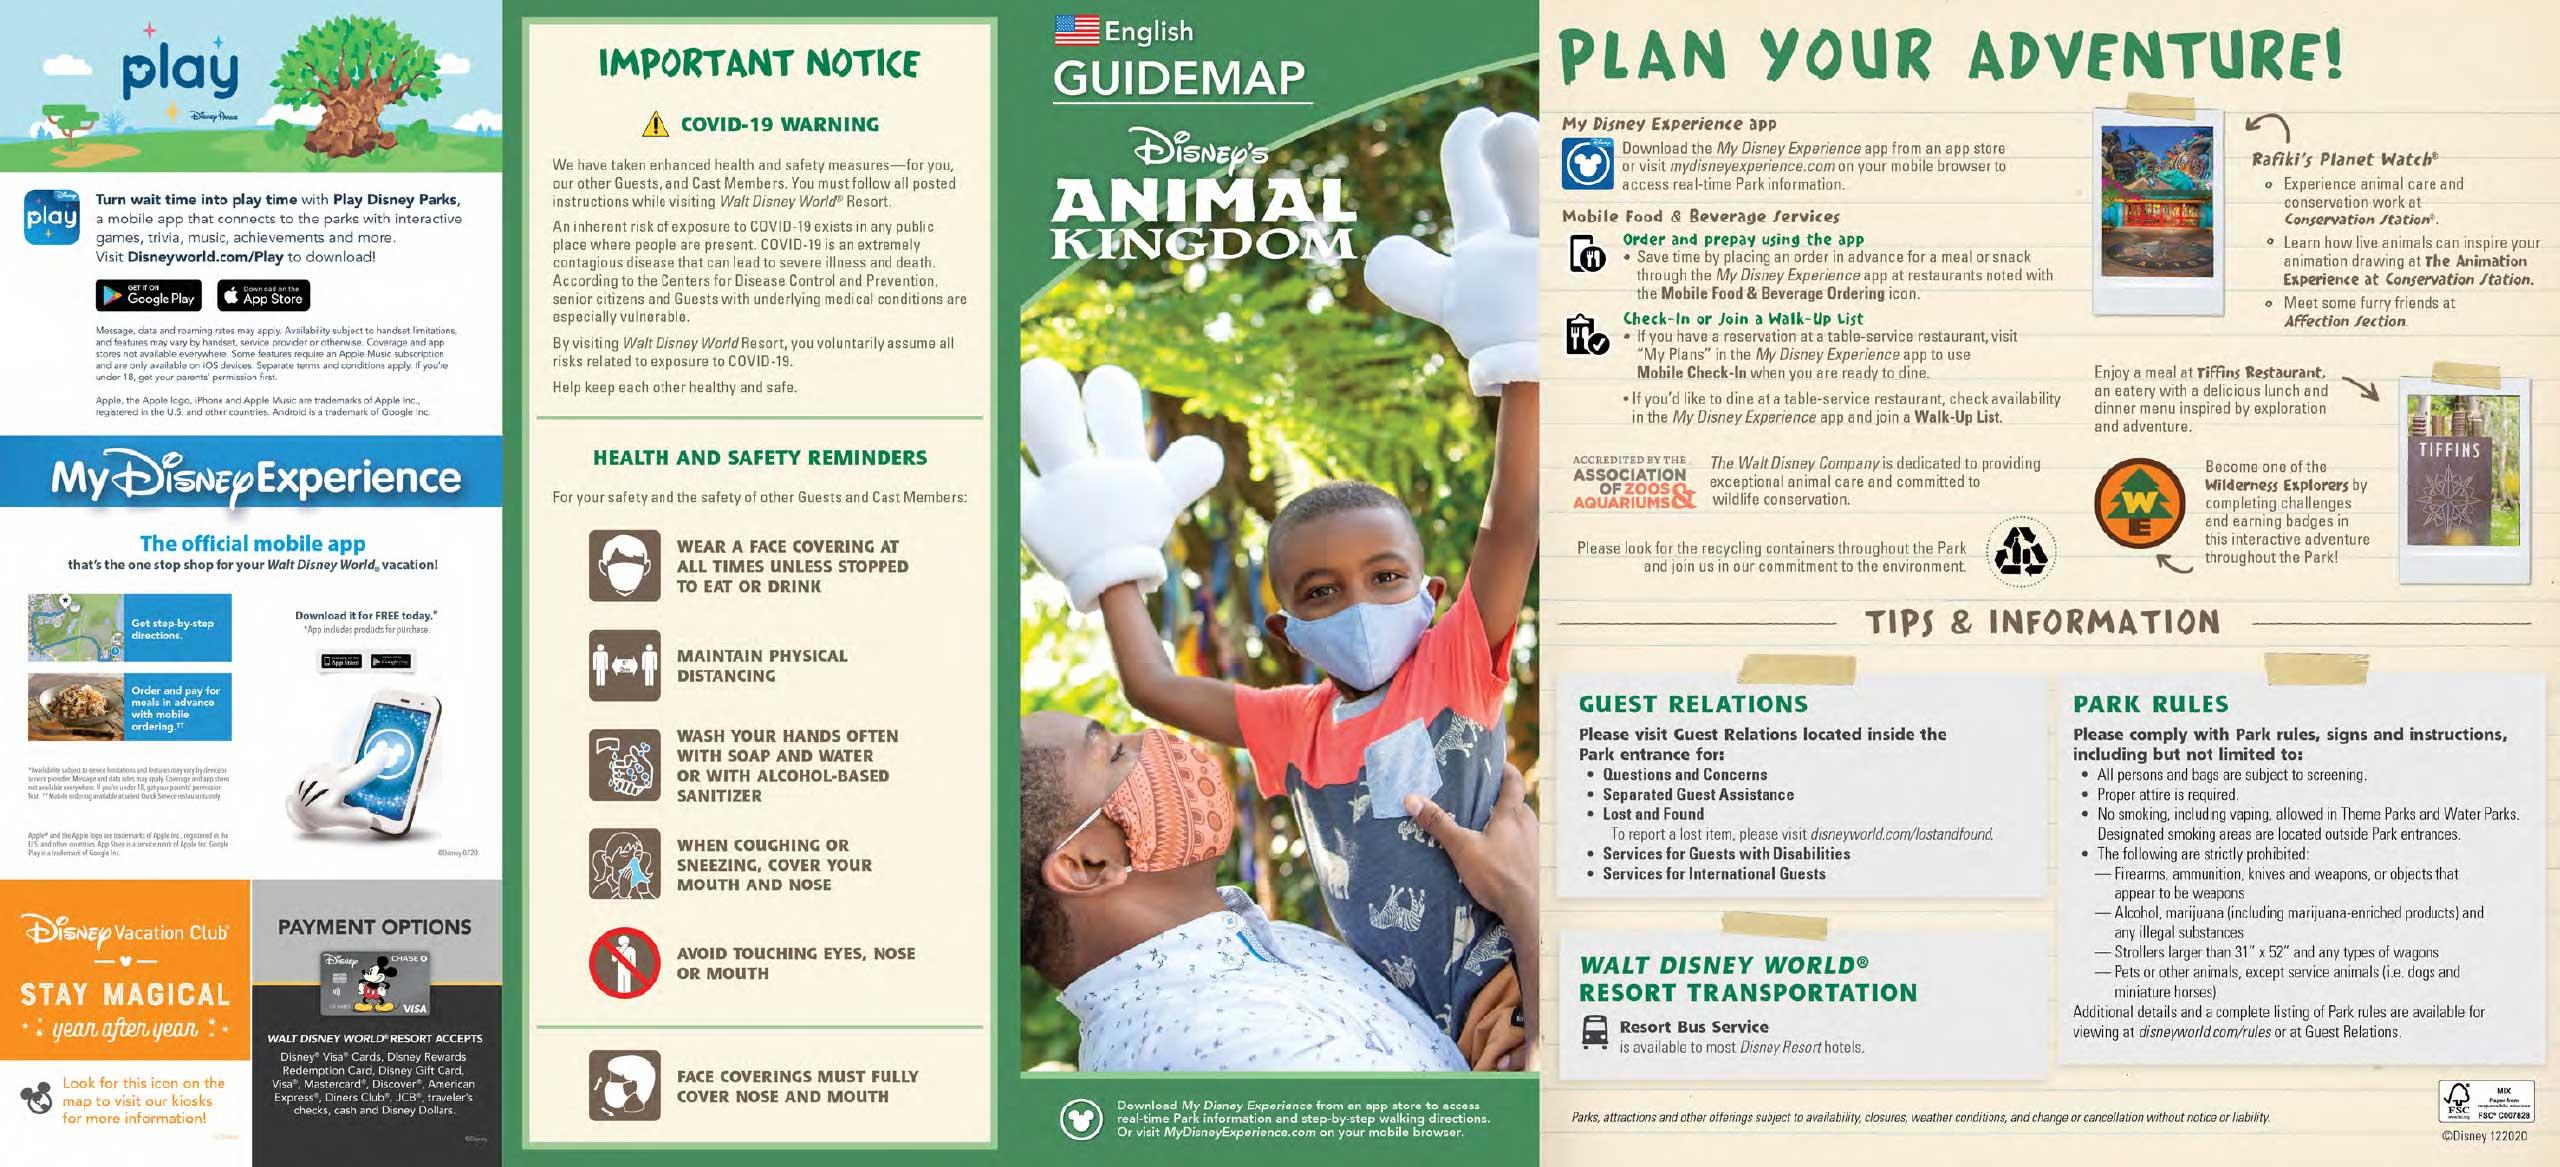 Disney's Animal Kingdom December 2020 guidemap